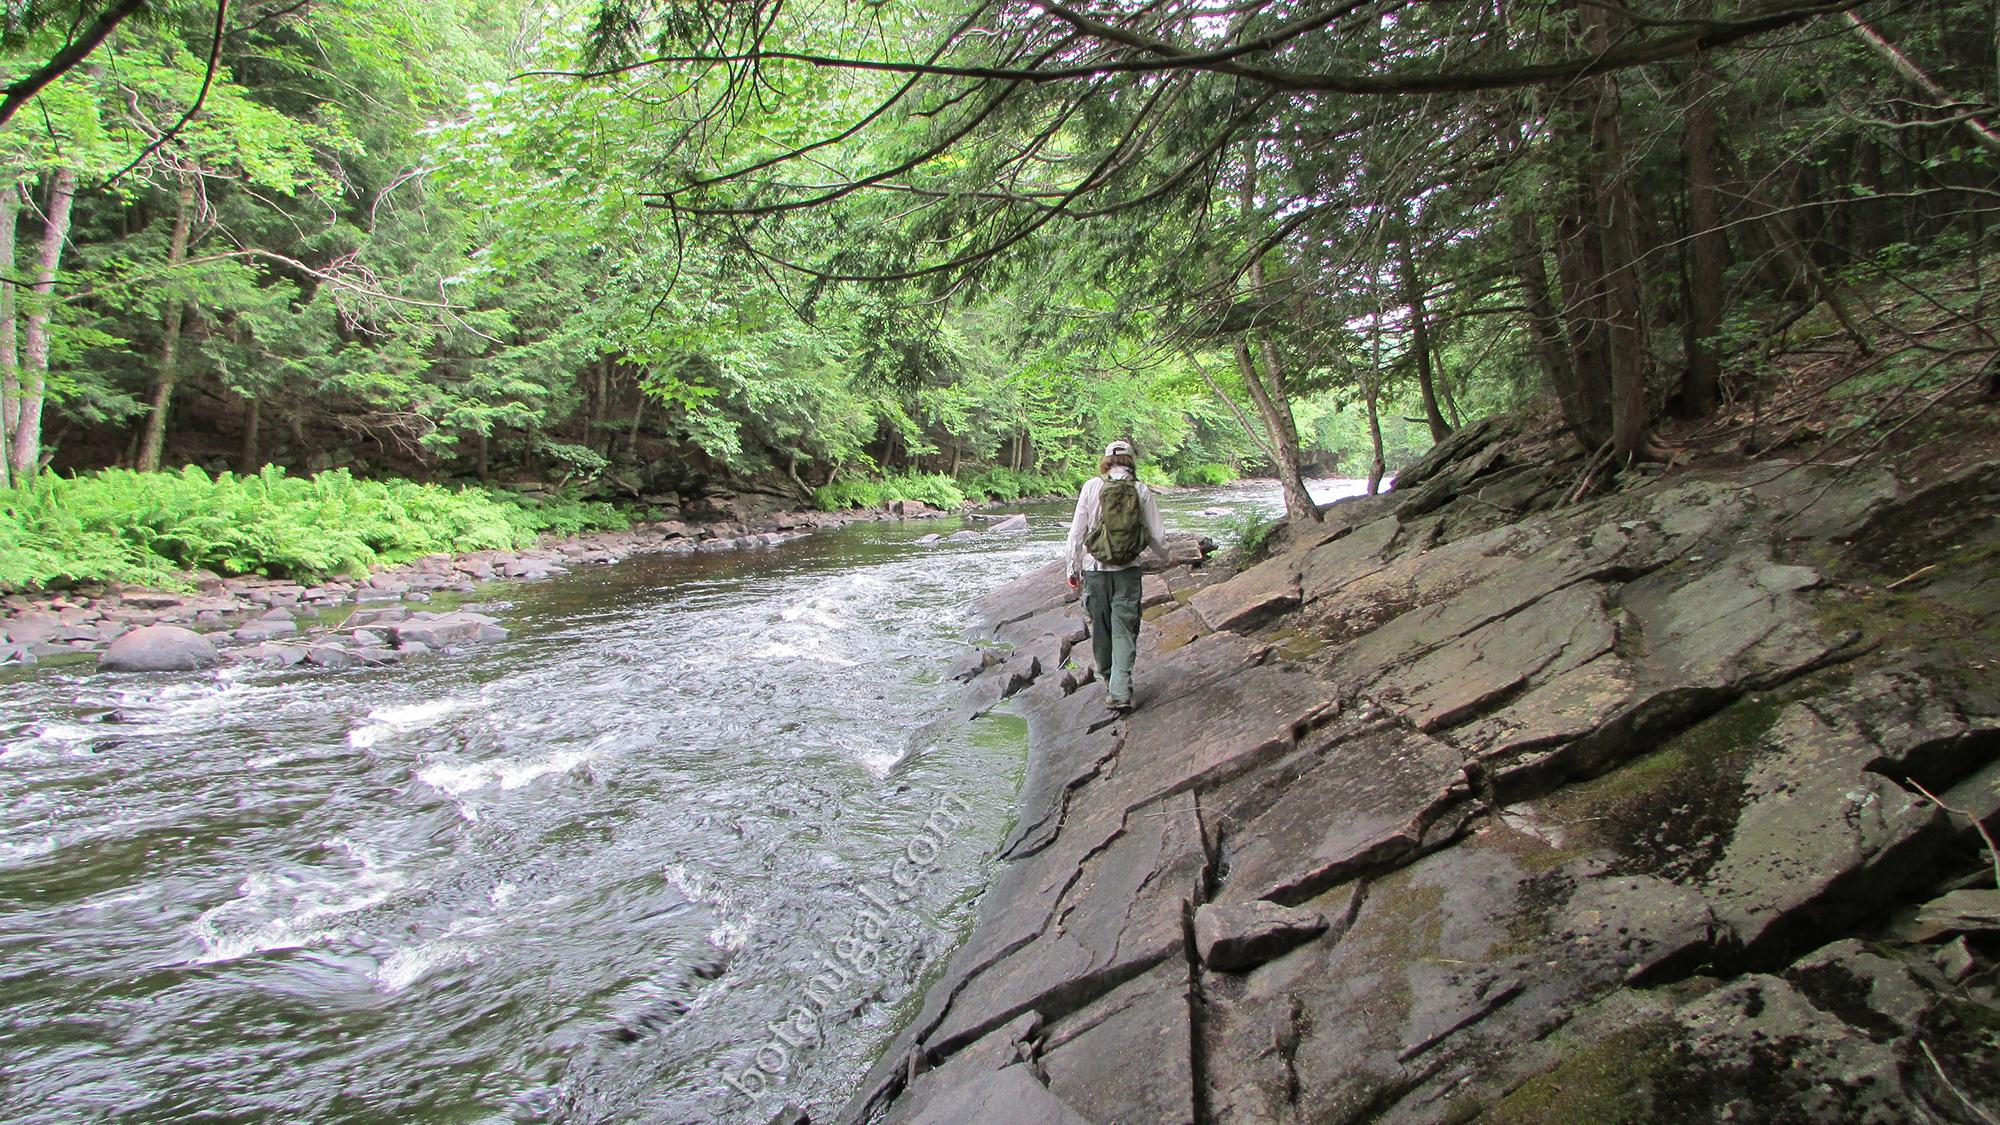 R.K. 2 Oxtongue Rapids Hiking along the rocks July 24 2016 035 wtm.jpg